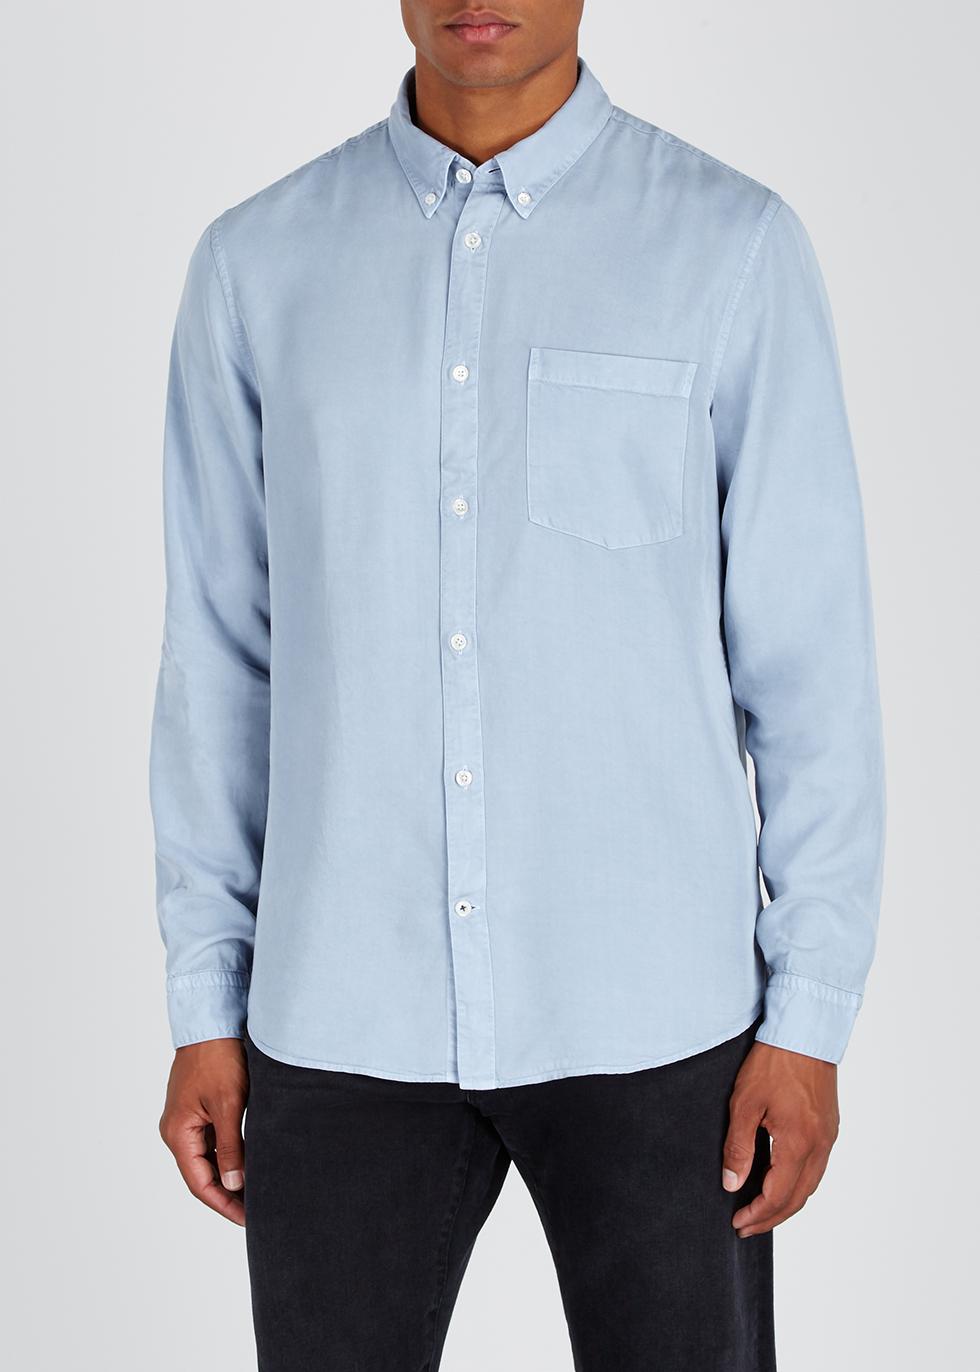 Falk blue Tencel shirt - NN07